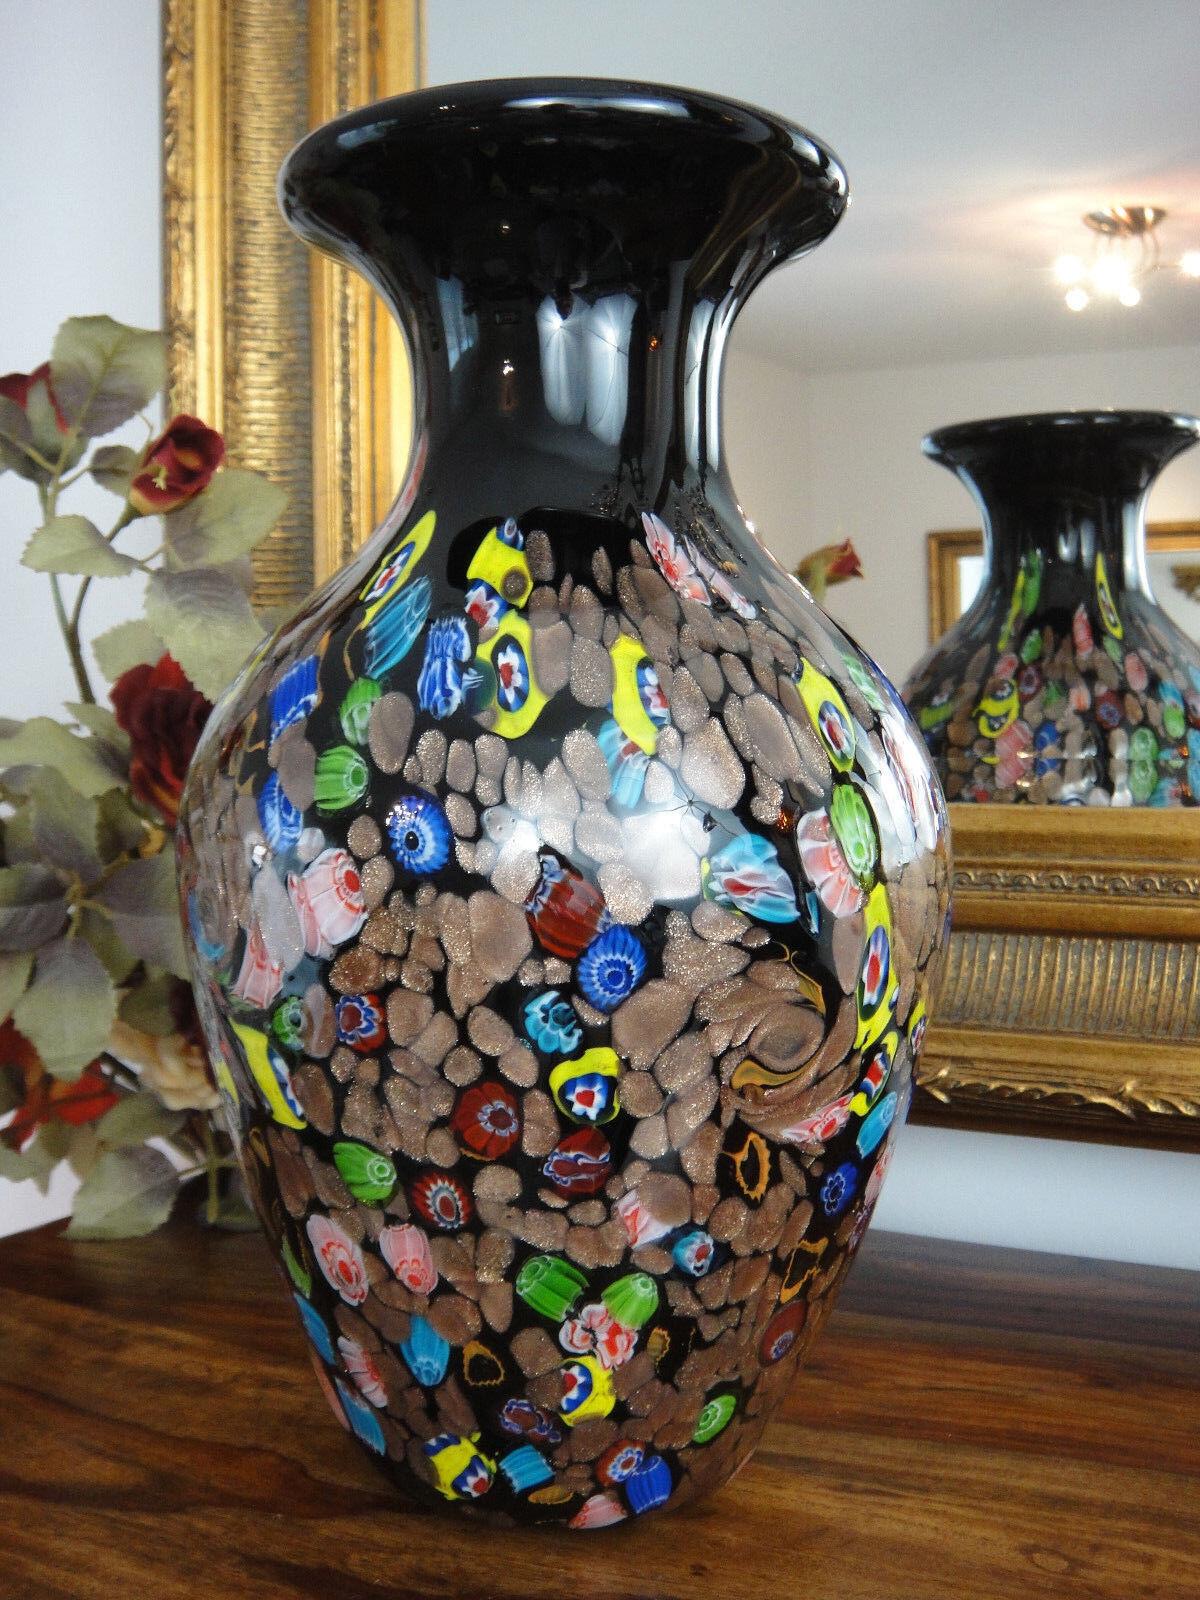 Luxus Vase Kristall Glas Kunst Stil Murano Blaumenvase Edel Edel Edel Glasvase Jugendstil fcfcbd